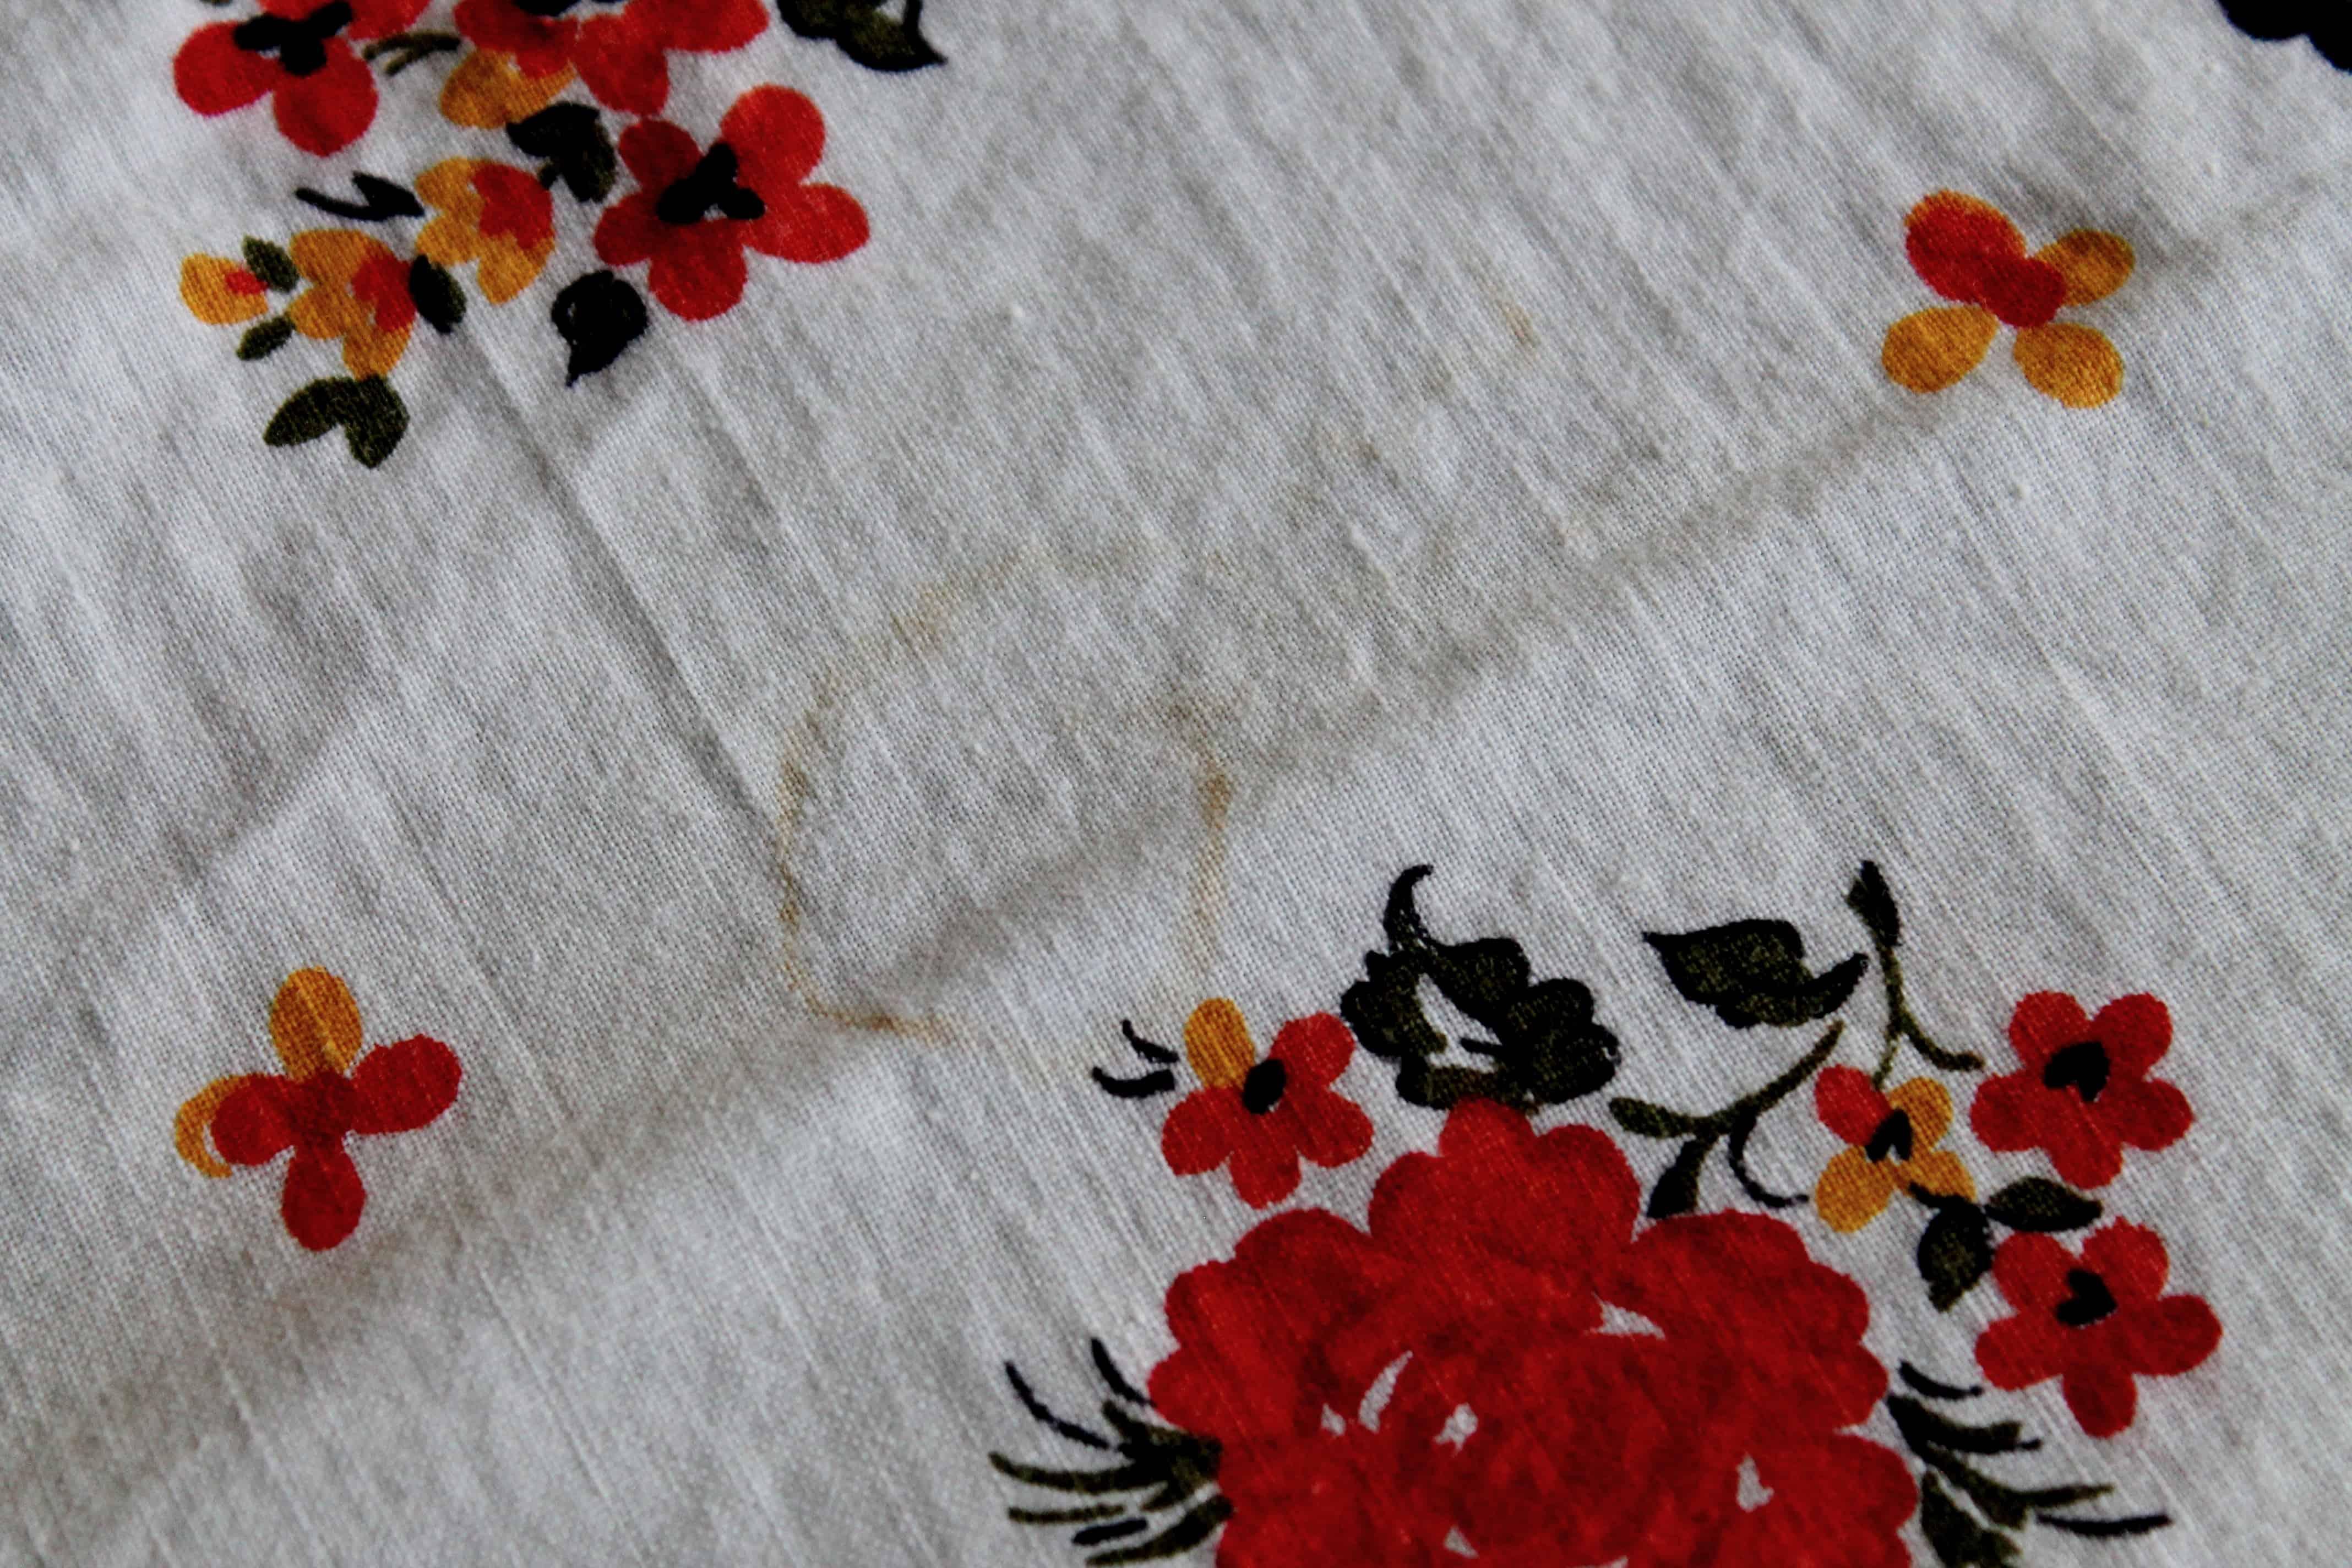 Scorch mark on vintage apron